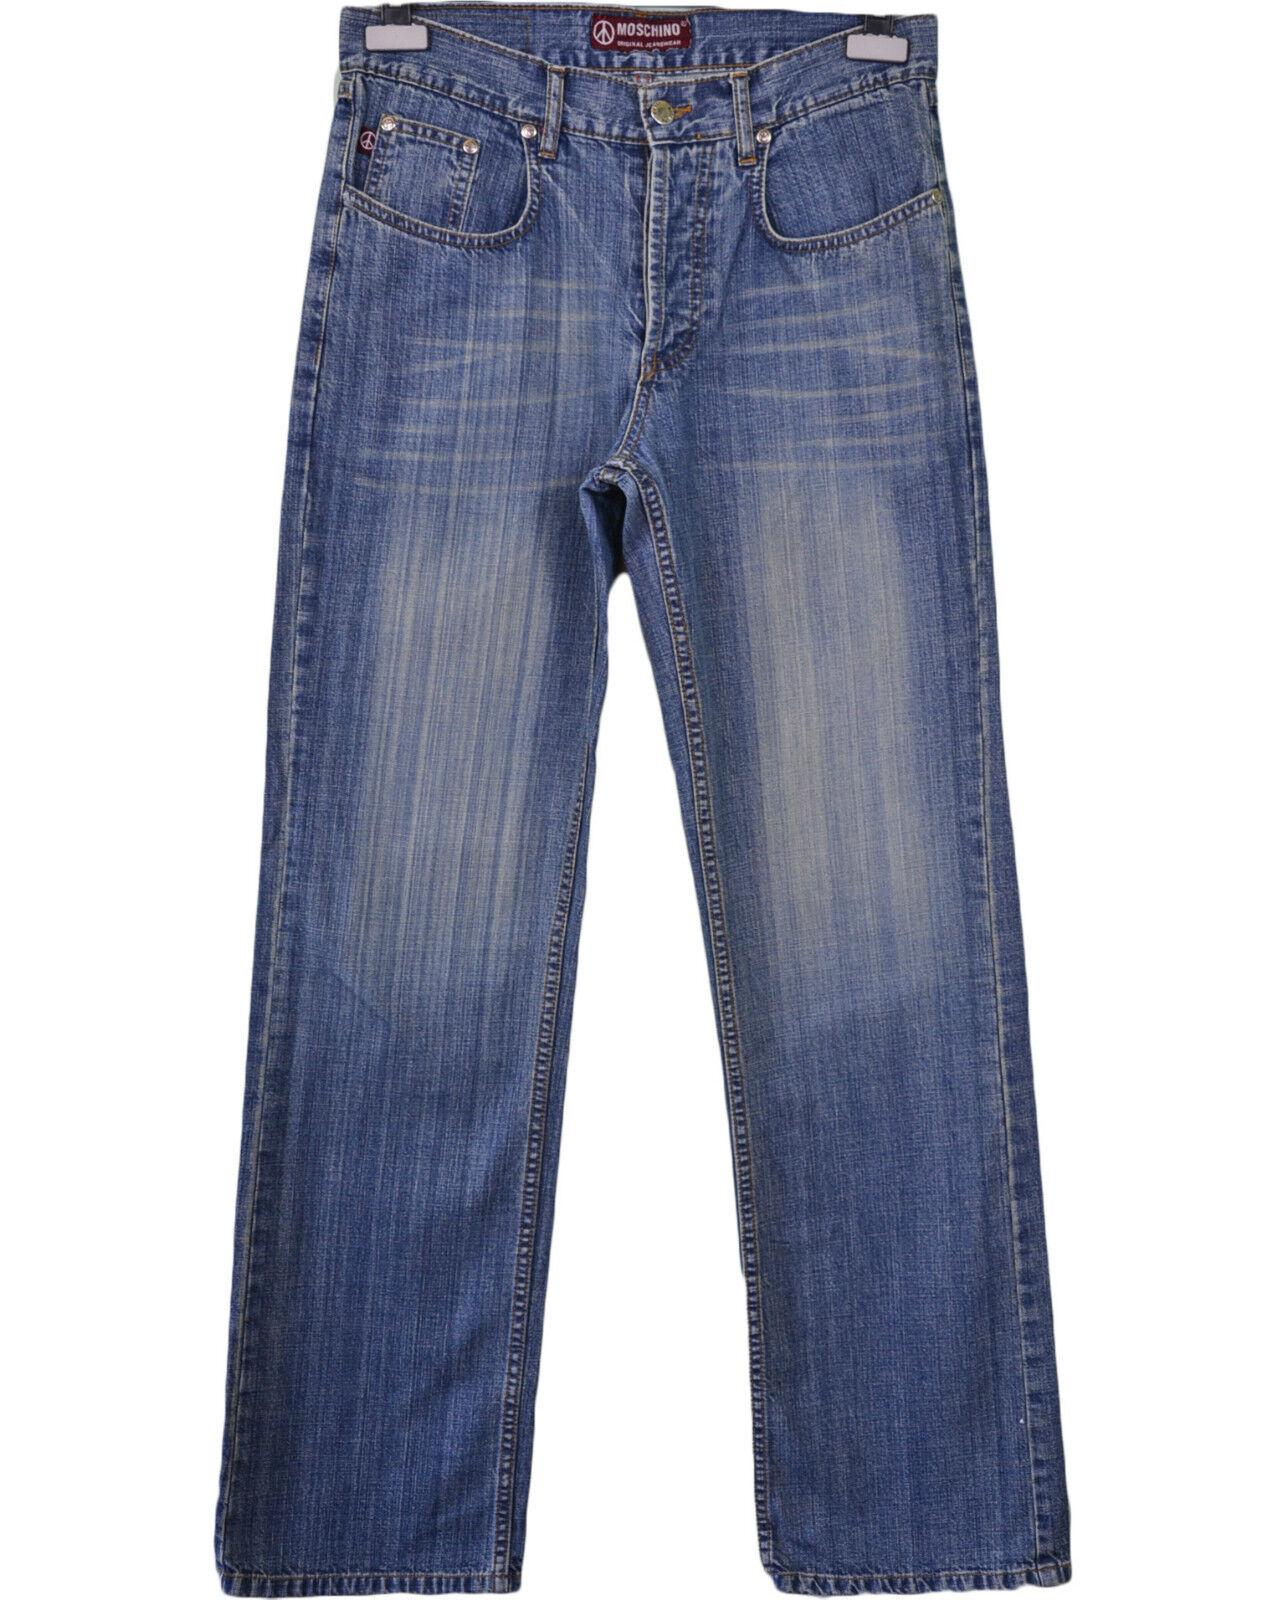 MOSCHINO Design Woman Vtg 90s Retro Casual Classic Straight Blau Jeans sz 32 Q58